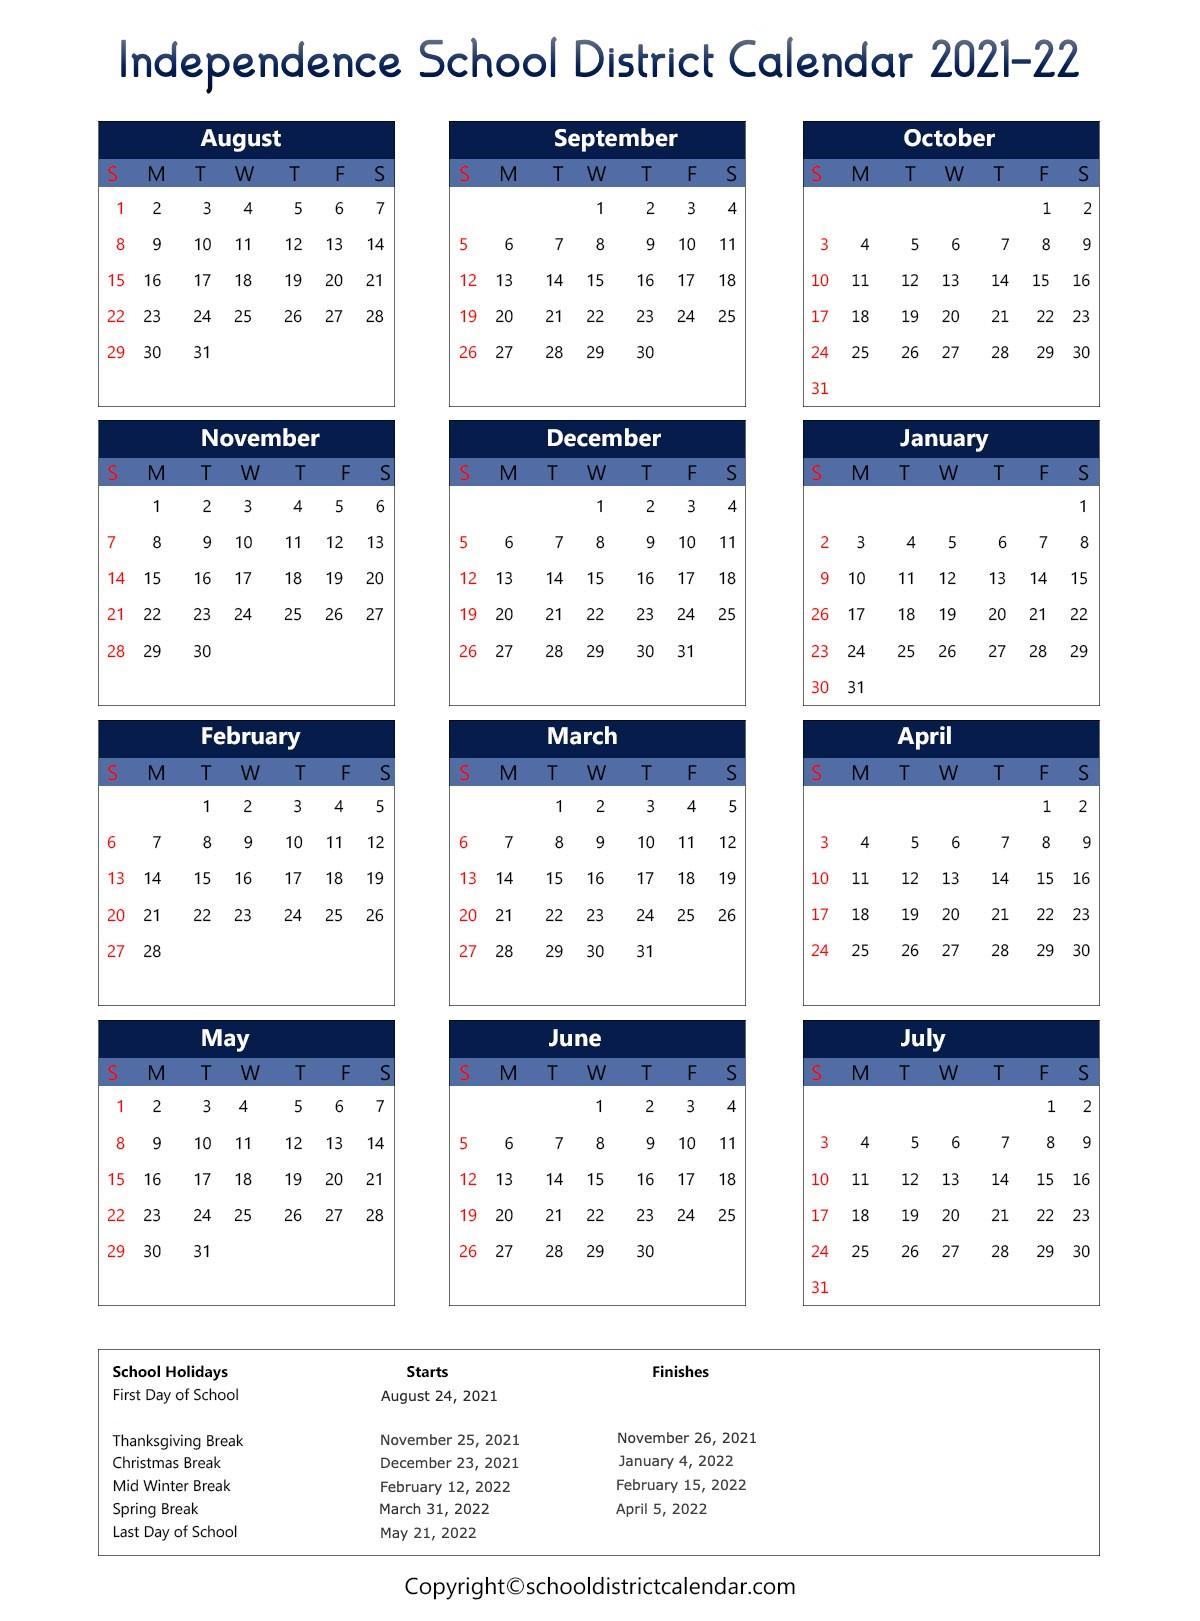 Scps Calendar 2022.Independence School District Calendar Holidays 2021 2022